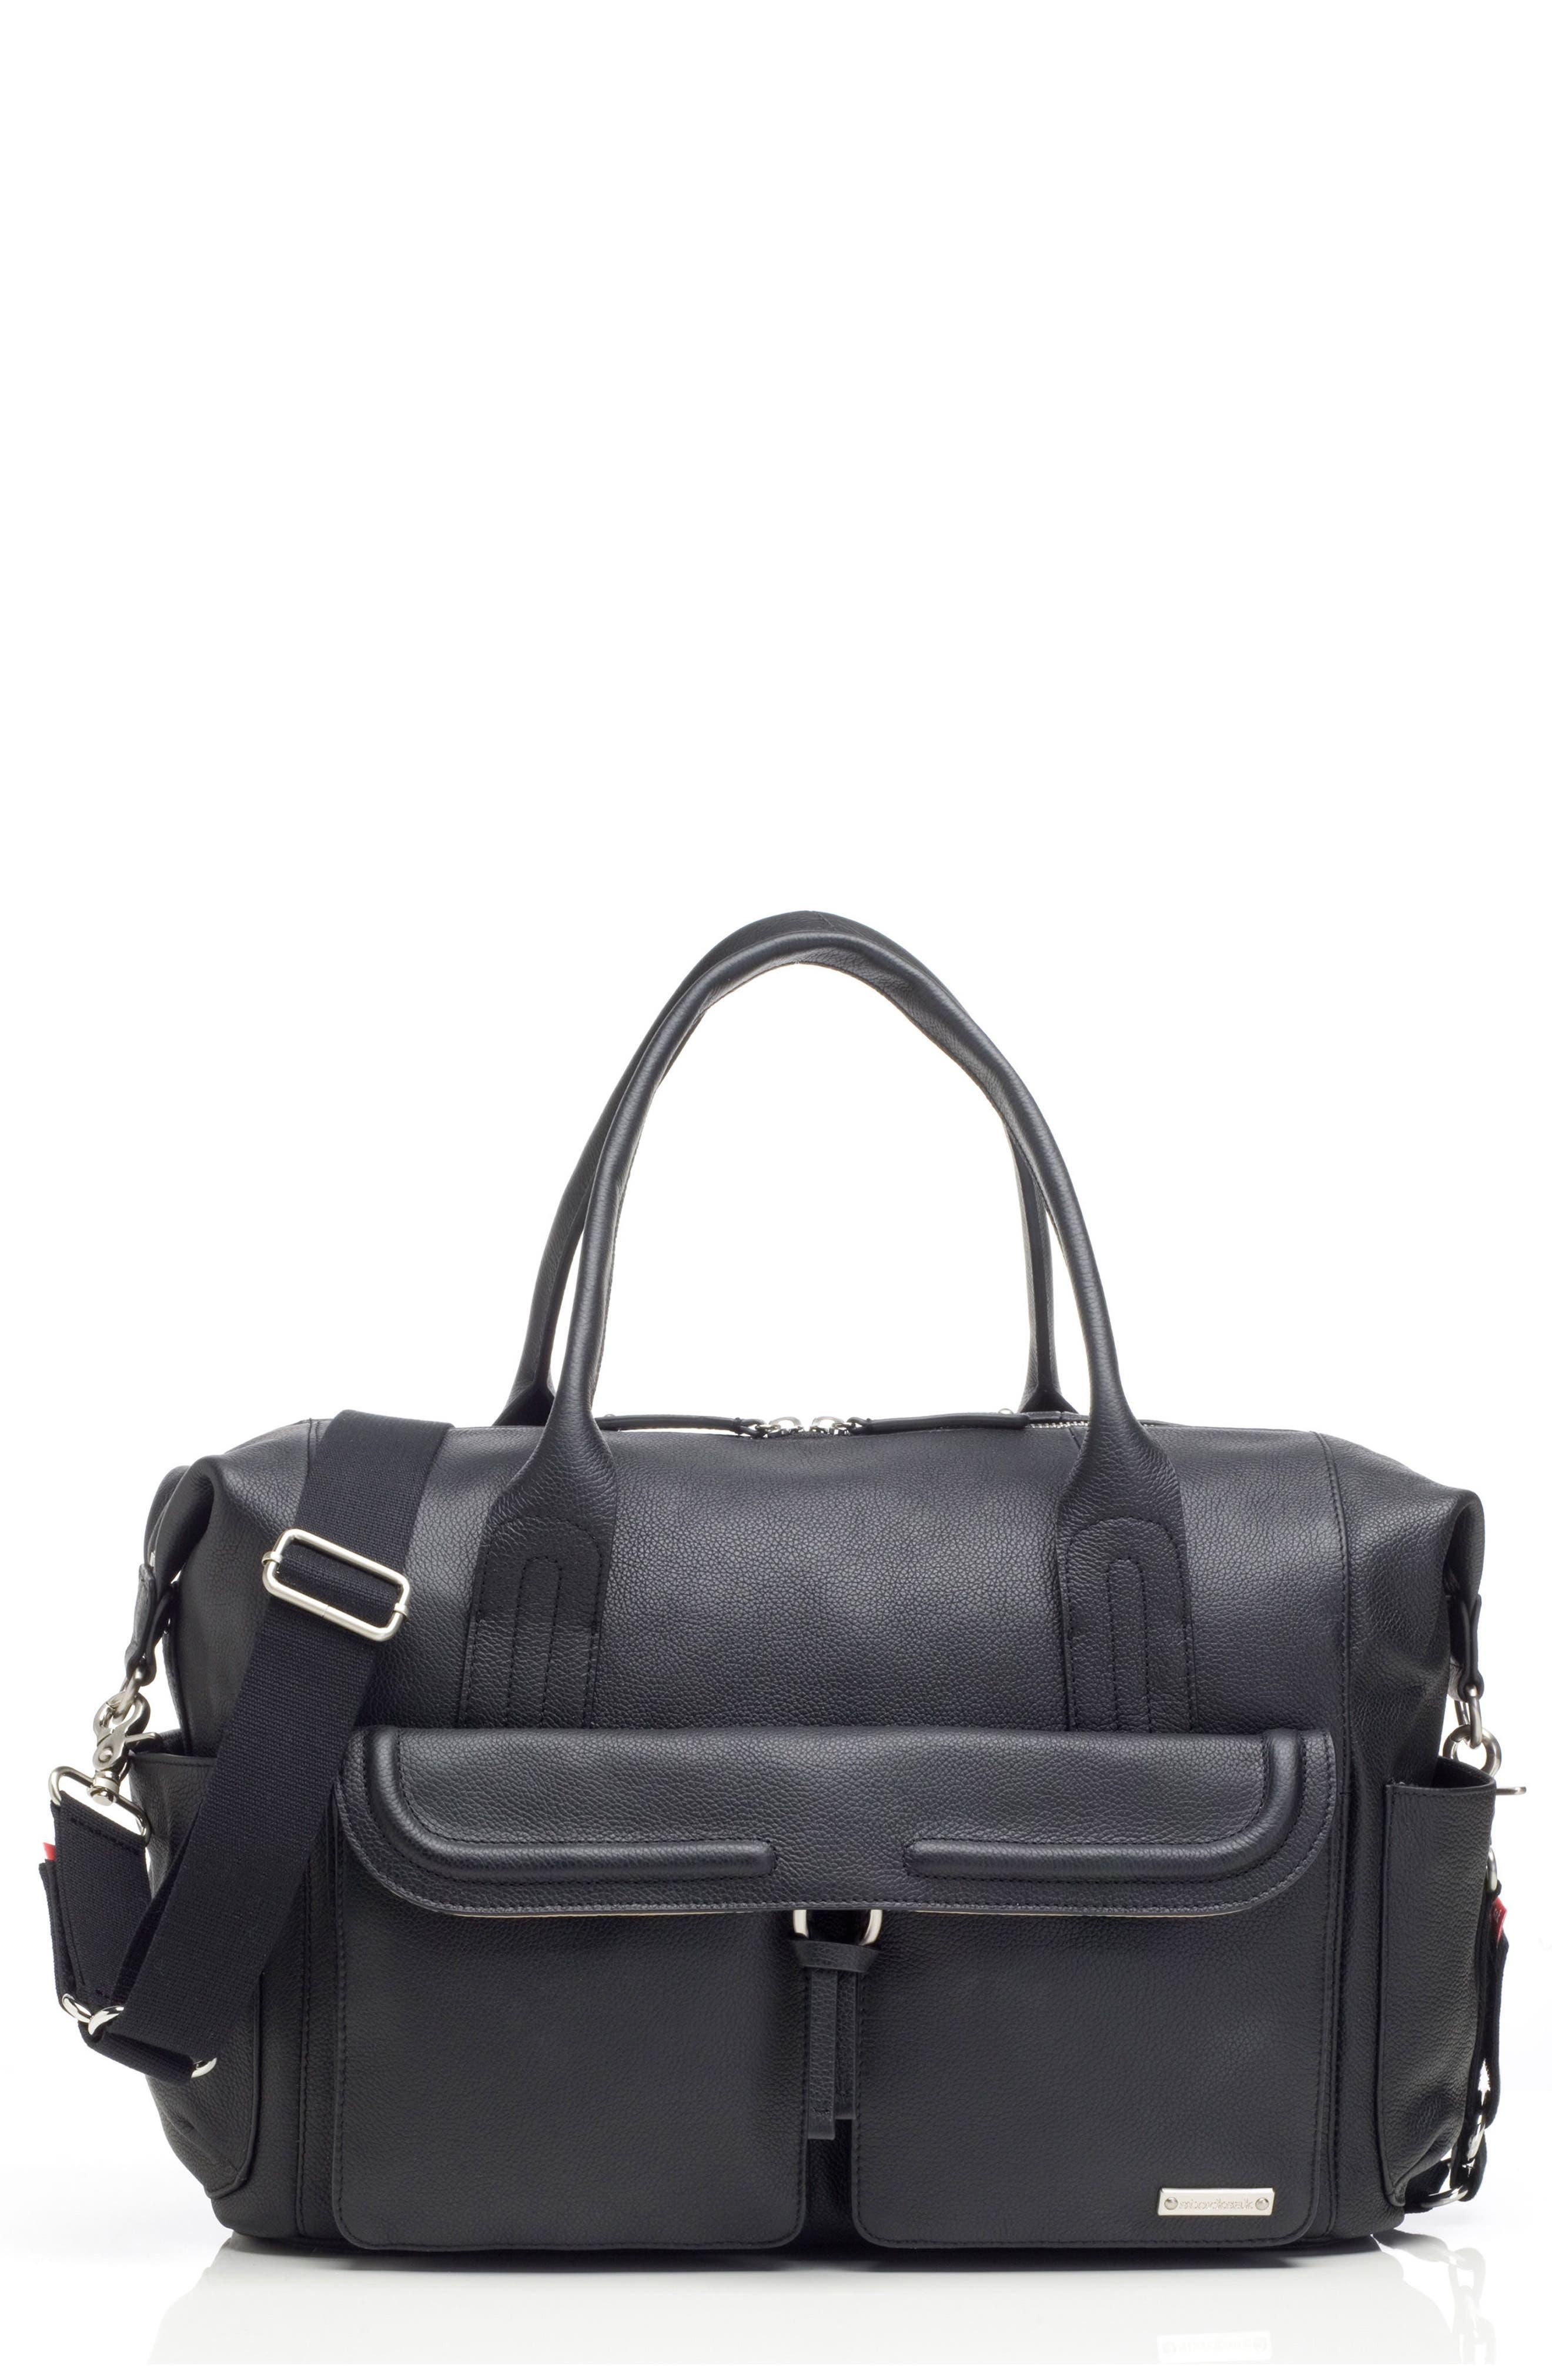 Storsak Leather Diaper Bag,                             Main thumbnail 1, color,                             BLACK